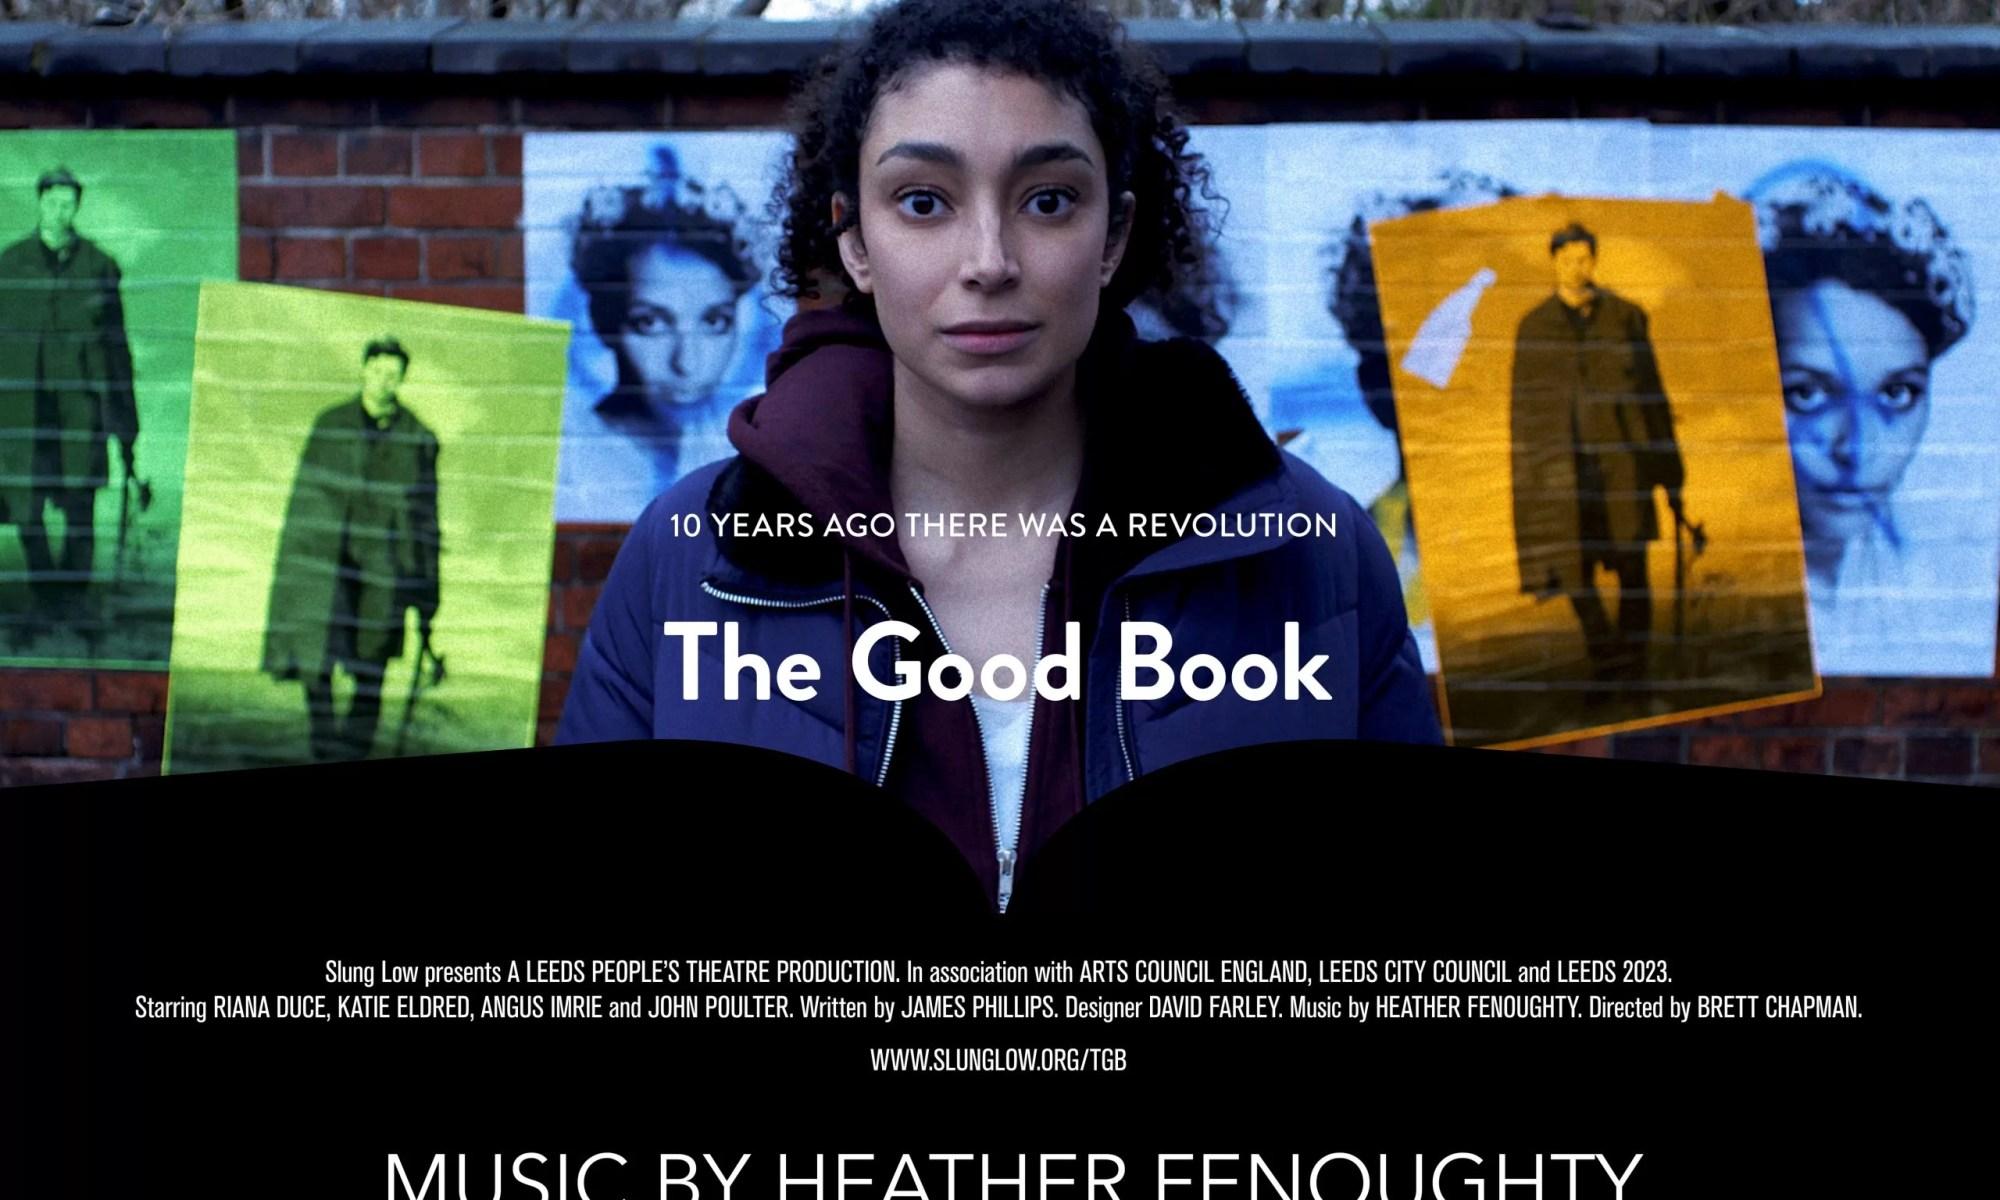 Cover Art for The Good Book Film Soundtrack Album